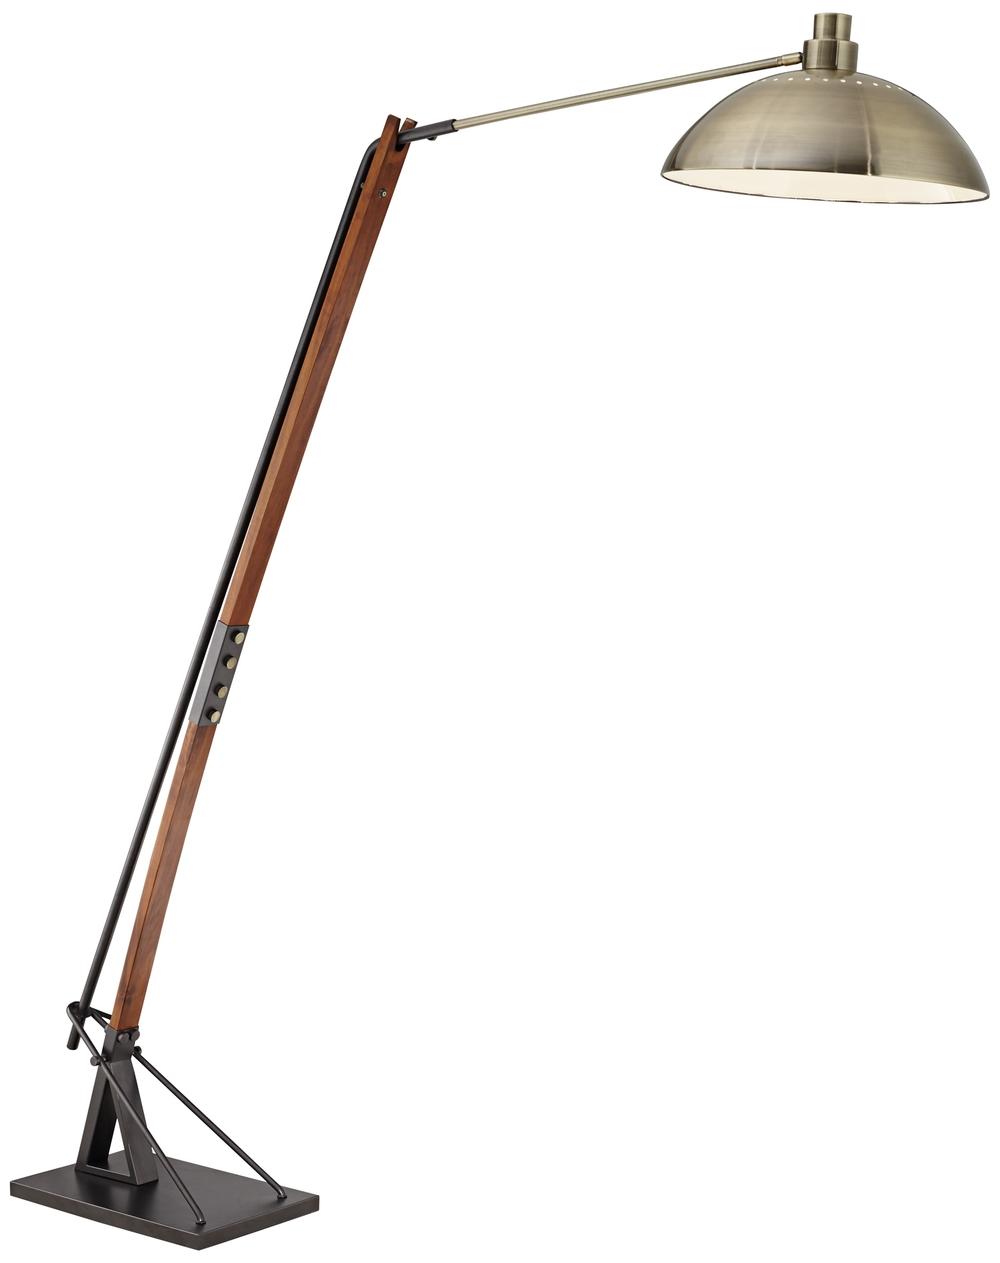 Pacific Coast Lighting - City Nights Floor Lamp